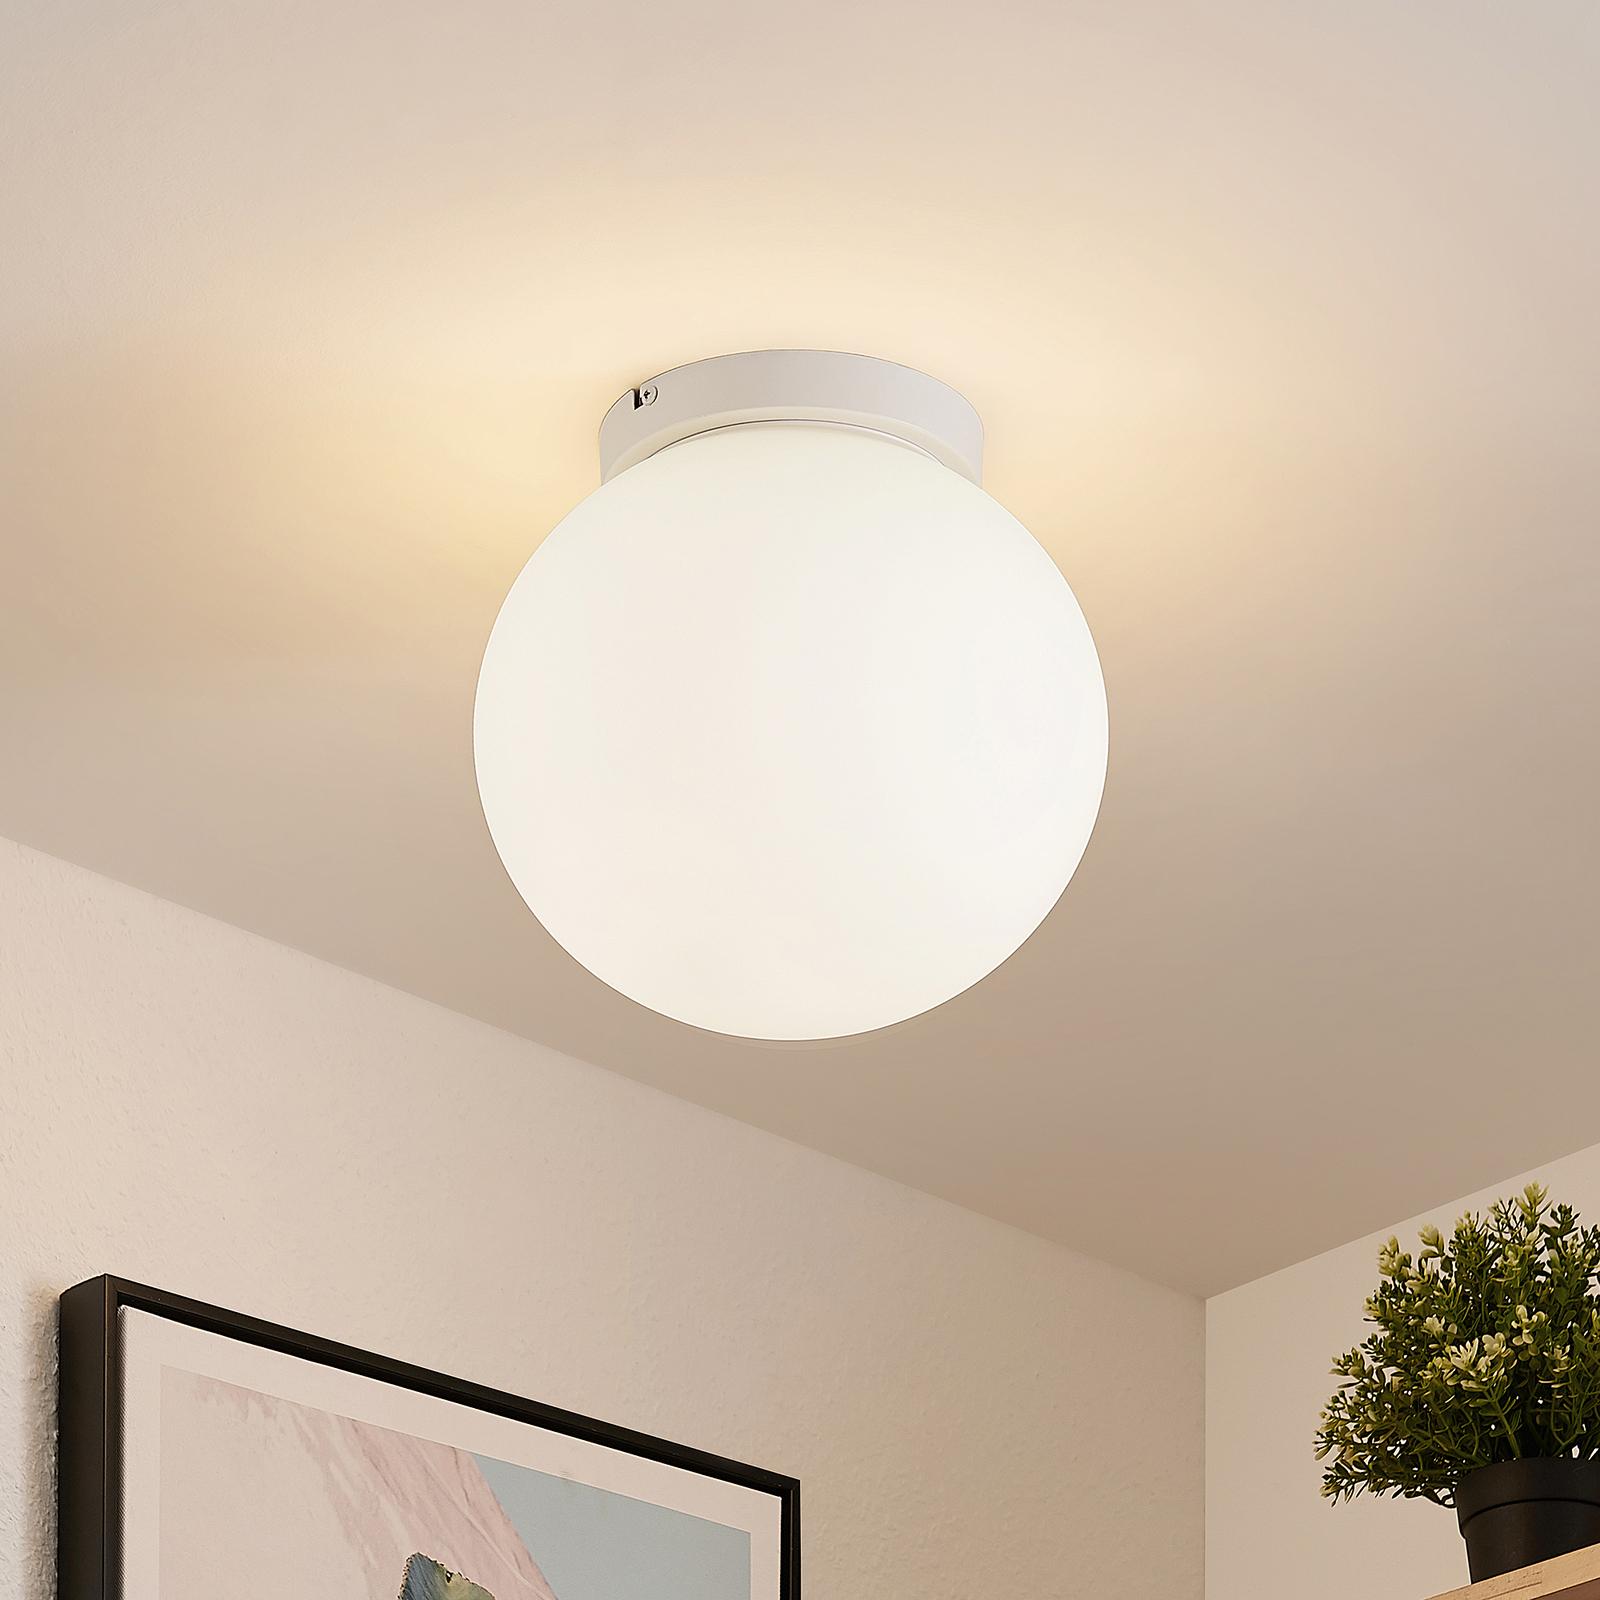 Lindby Meriala taklampe, hvit, glass Ø 25 cm